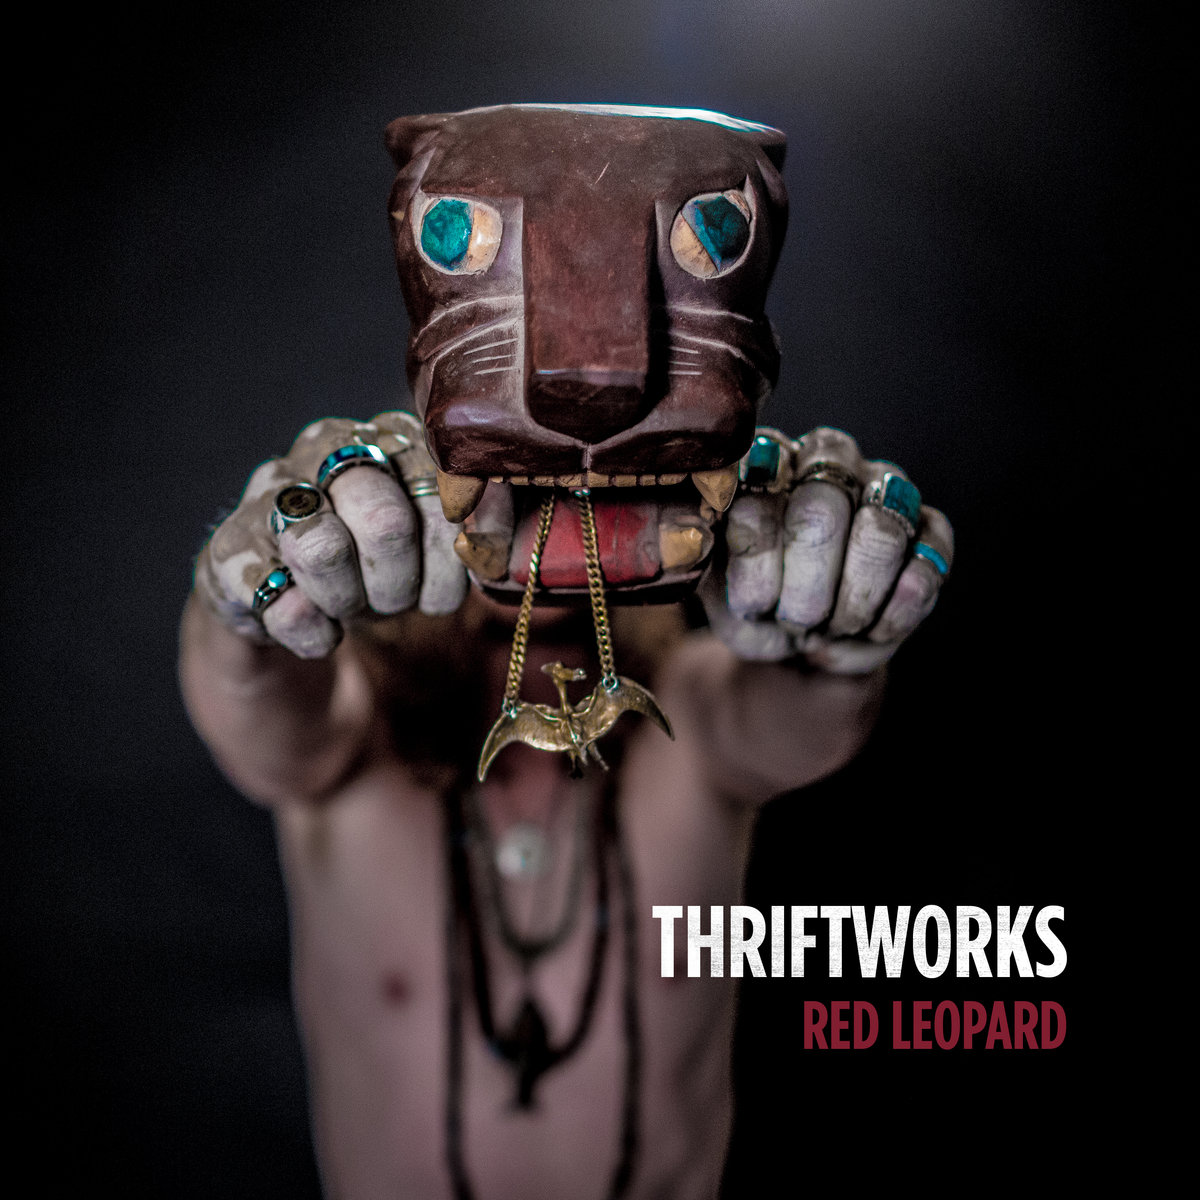 40. Thriftworks - Red Leopard